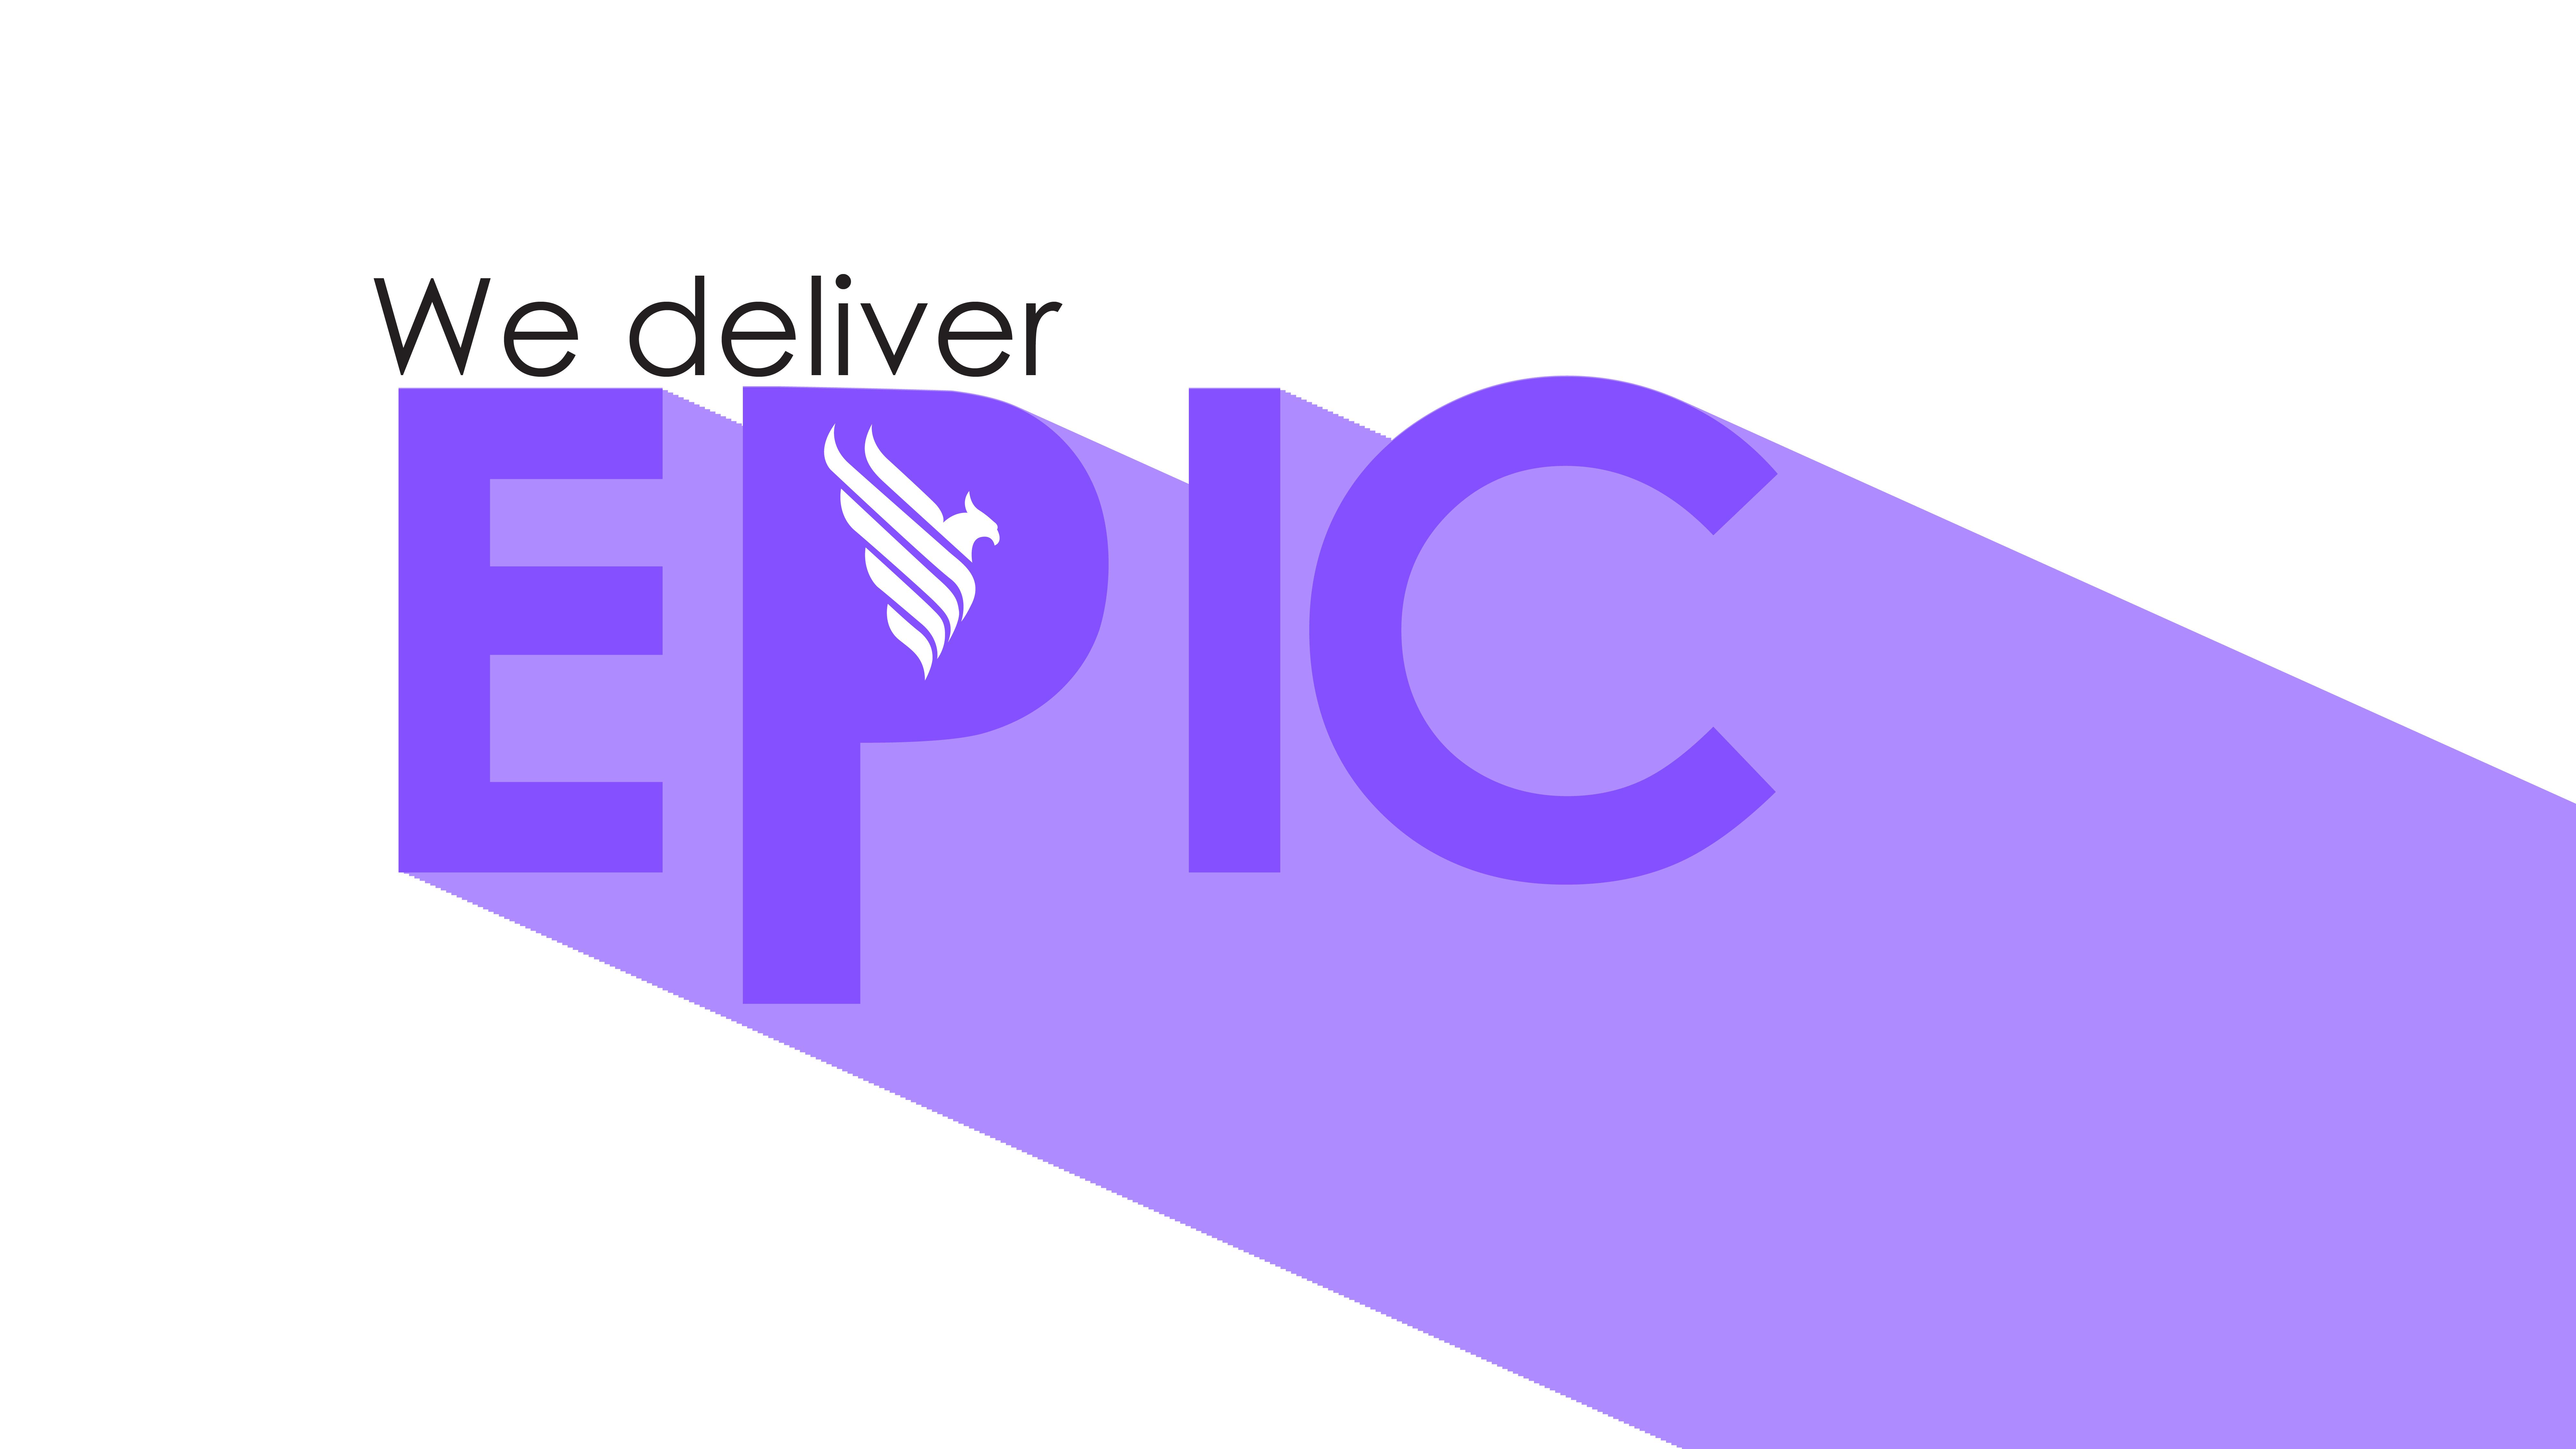 Epic-phoenix talentx branding work